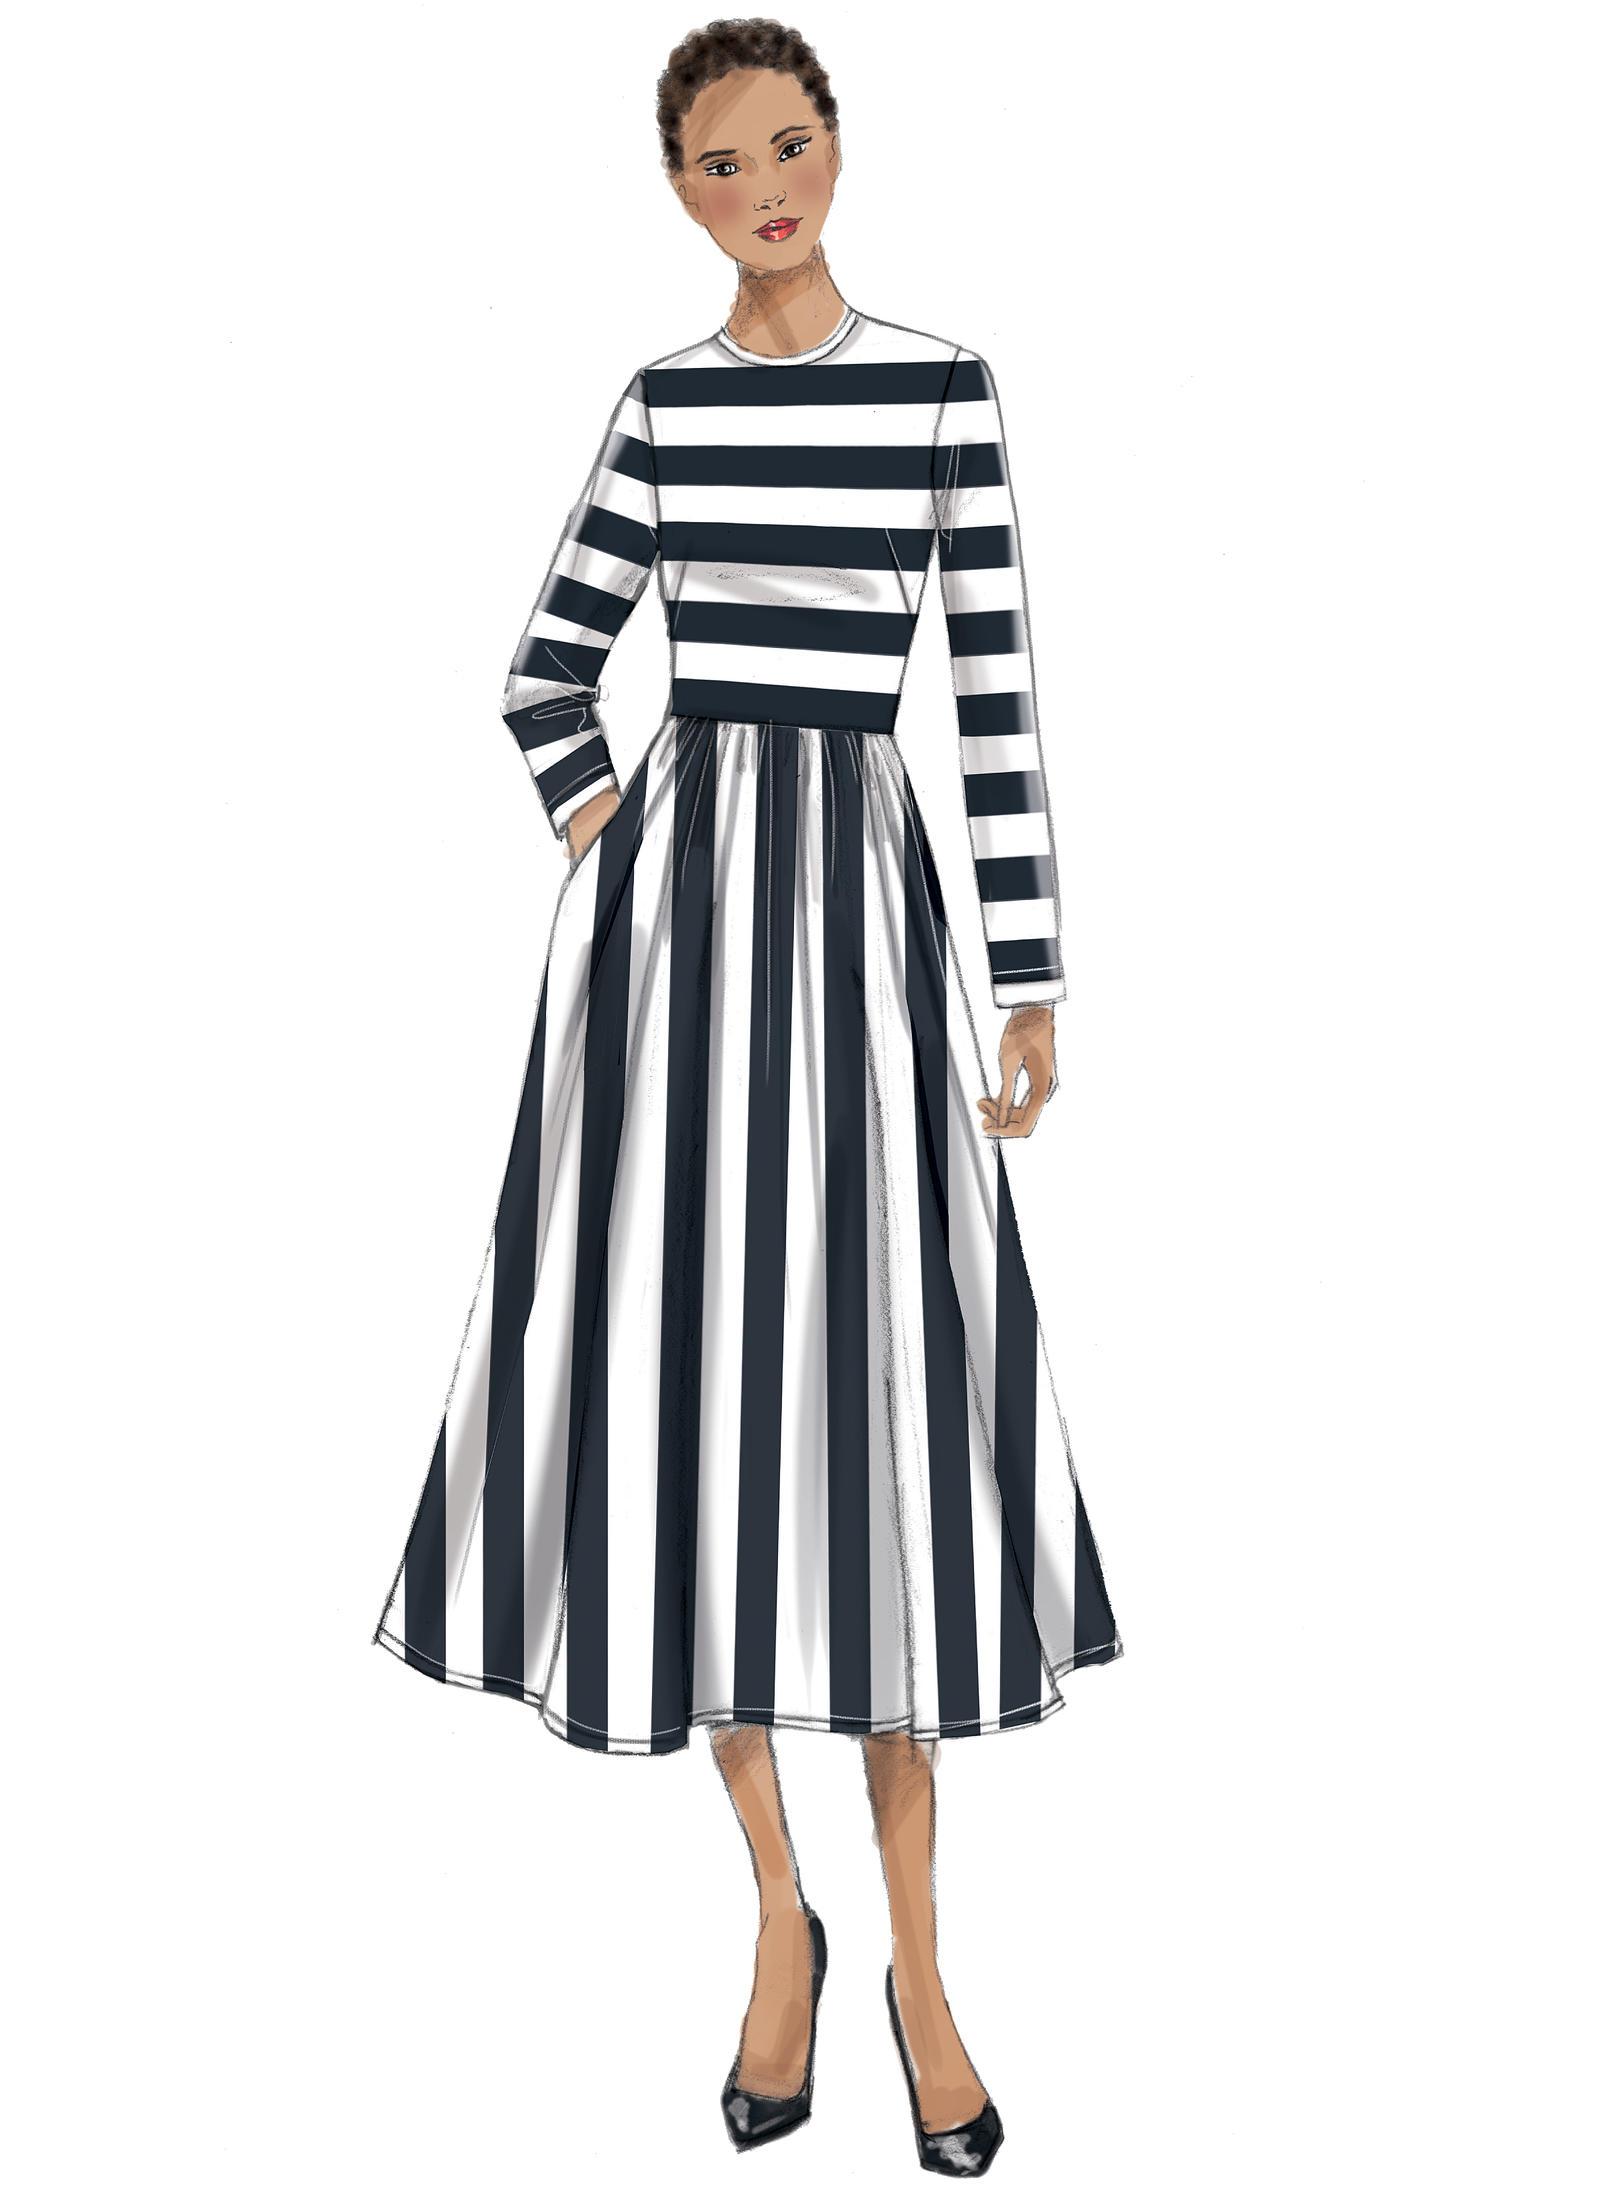 Vogue Patterns 9197 MISSES' JEWEL-NECK, GATHERED-SKIRT DRESSES